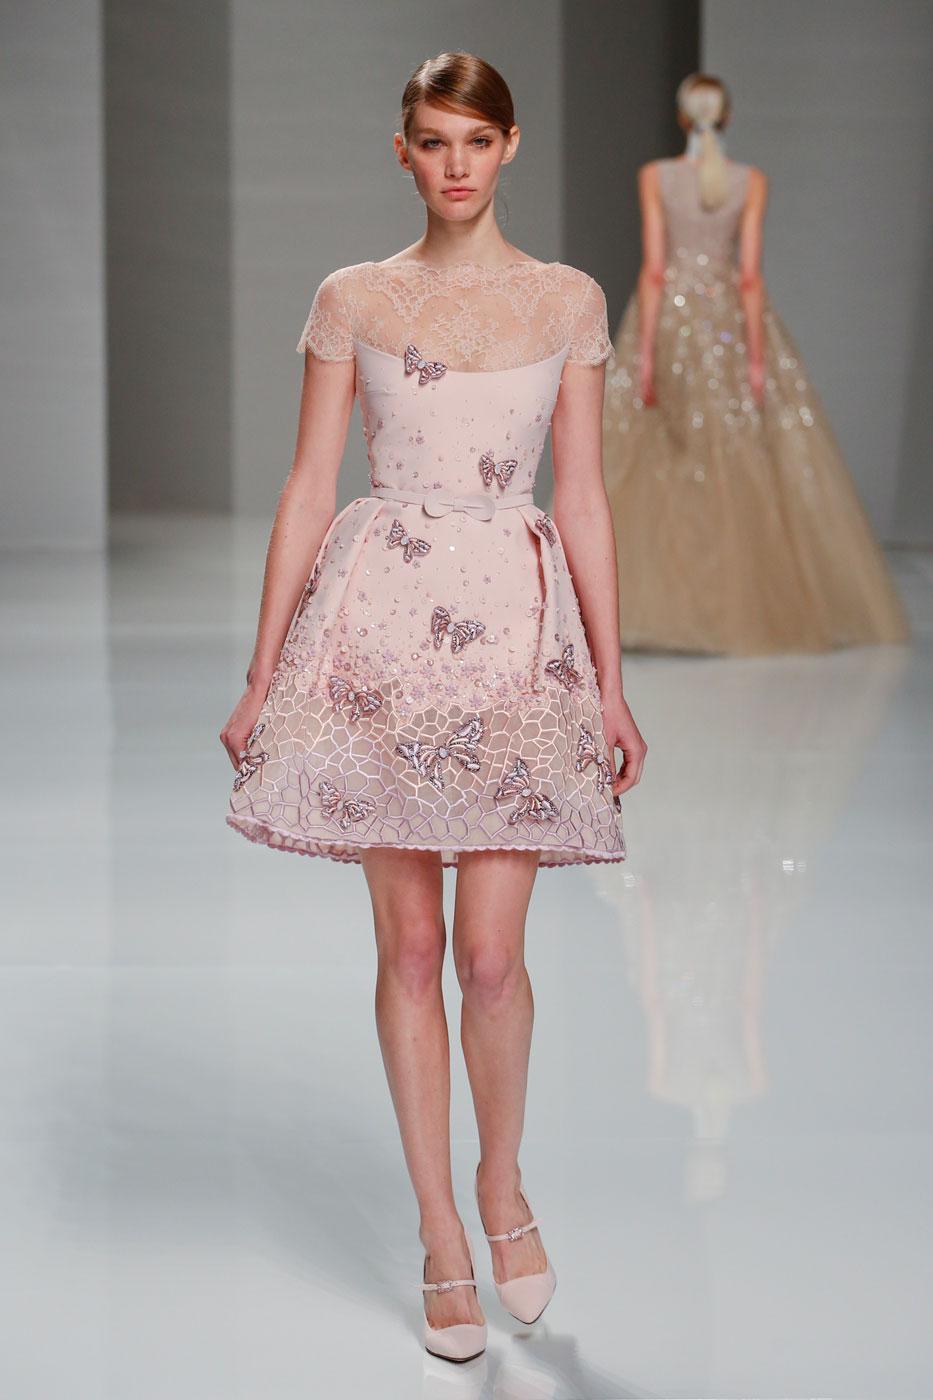 Georges-Hobeika-fashion-runway-show-haute-couture-paris-spring-2015-the-impression-57